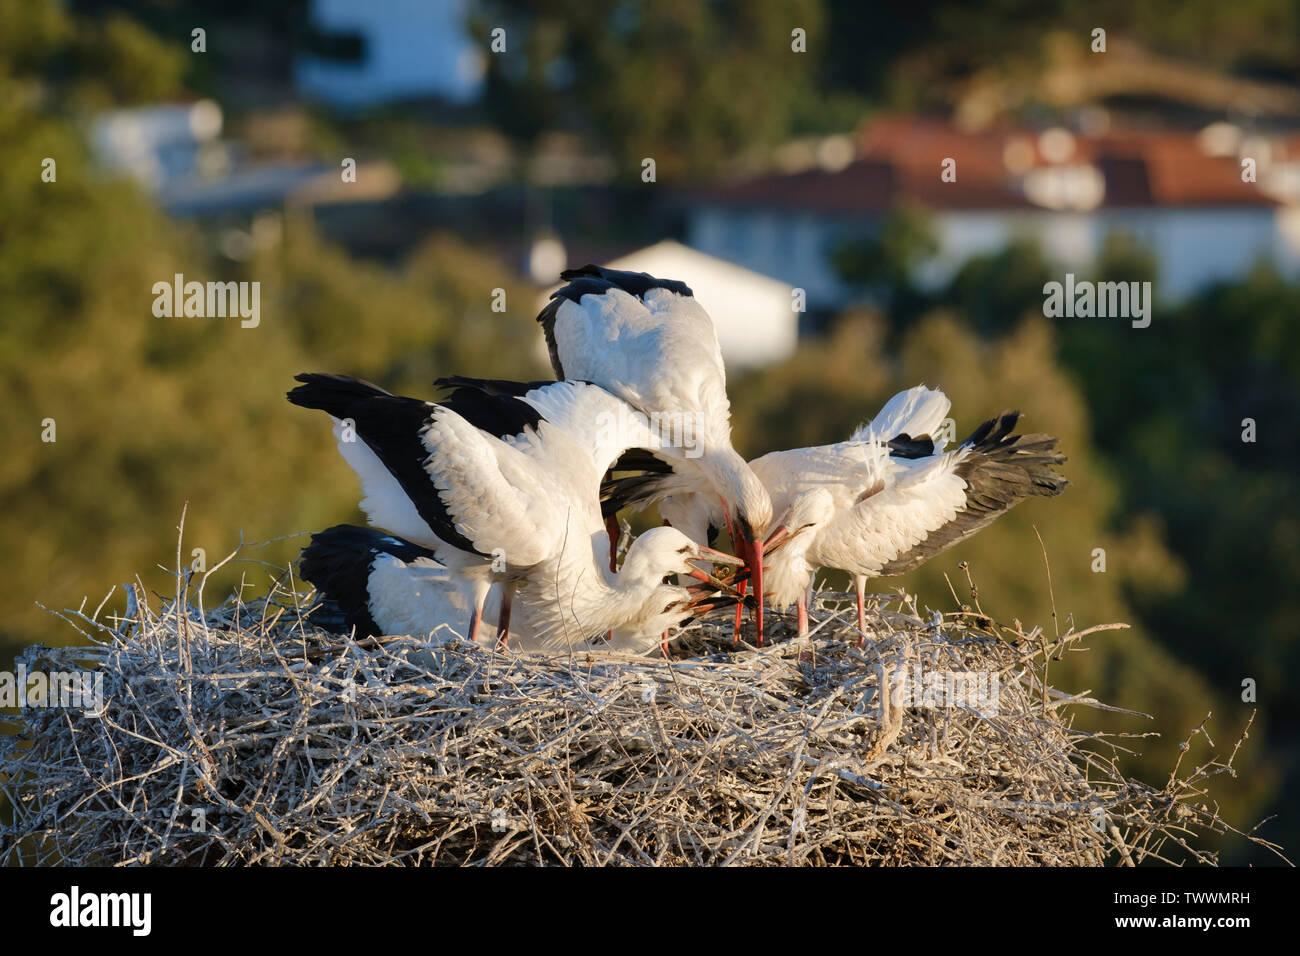 White stork (Ciconia ciconia) feeding three chicks. Valencia de Alcantara. Extremadura. Spain. Stock Photo